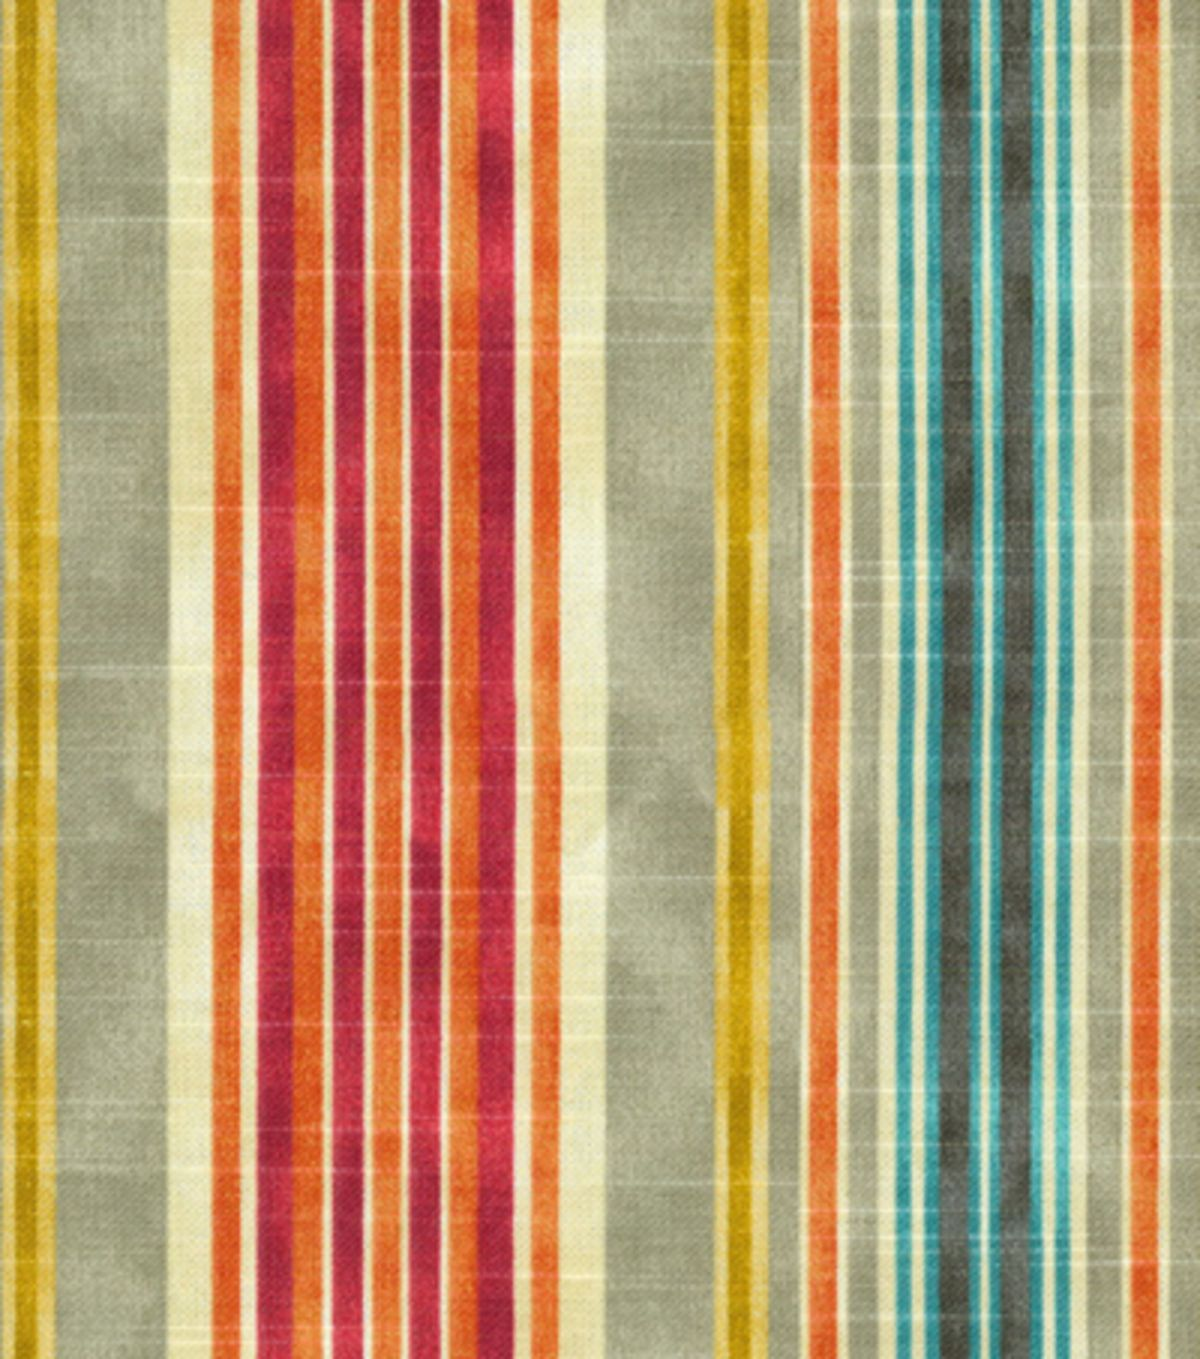 Home Decor Print Fabric- HGTV HOME One Way Fog